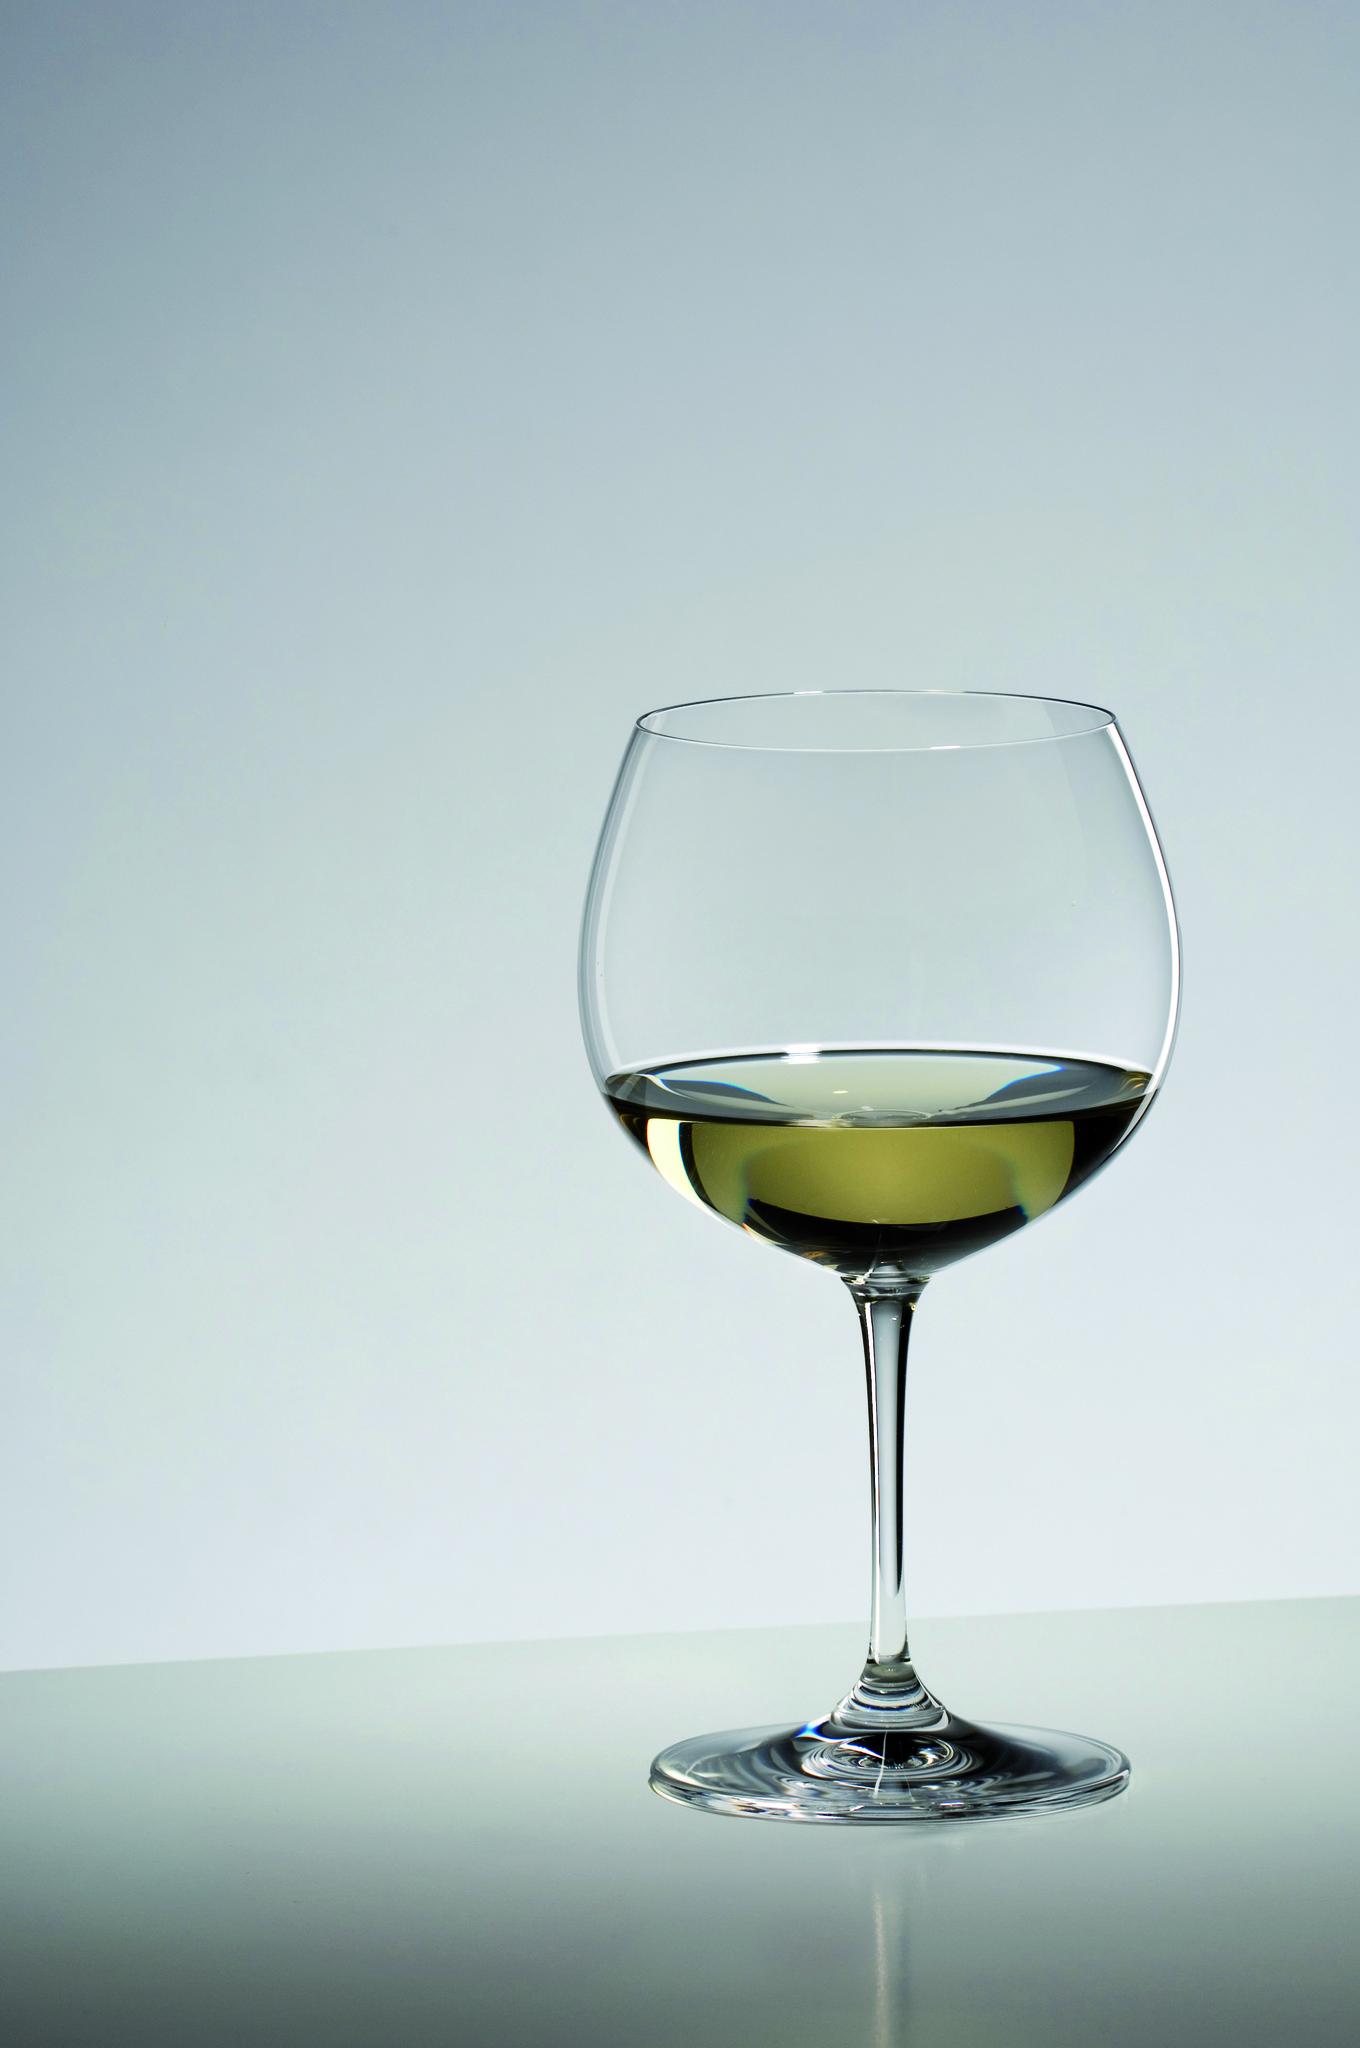 Бокалы Набор бокалов для белого вина 2шт 600мл Riedel Vinum Montrachet nabor-bokalov-dlya-belogo-vina-2-sht-600-ml-riedel-vinum-montrachet-avstriya.jpg